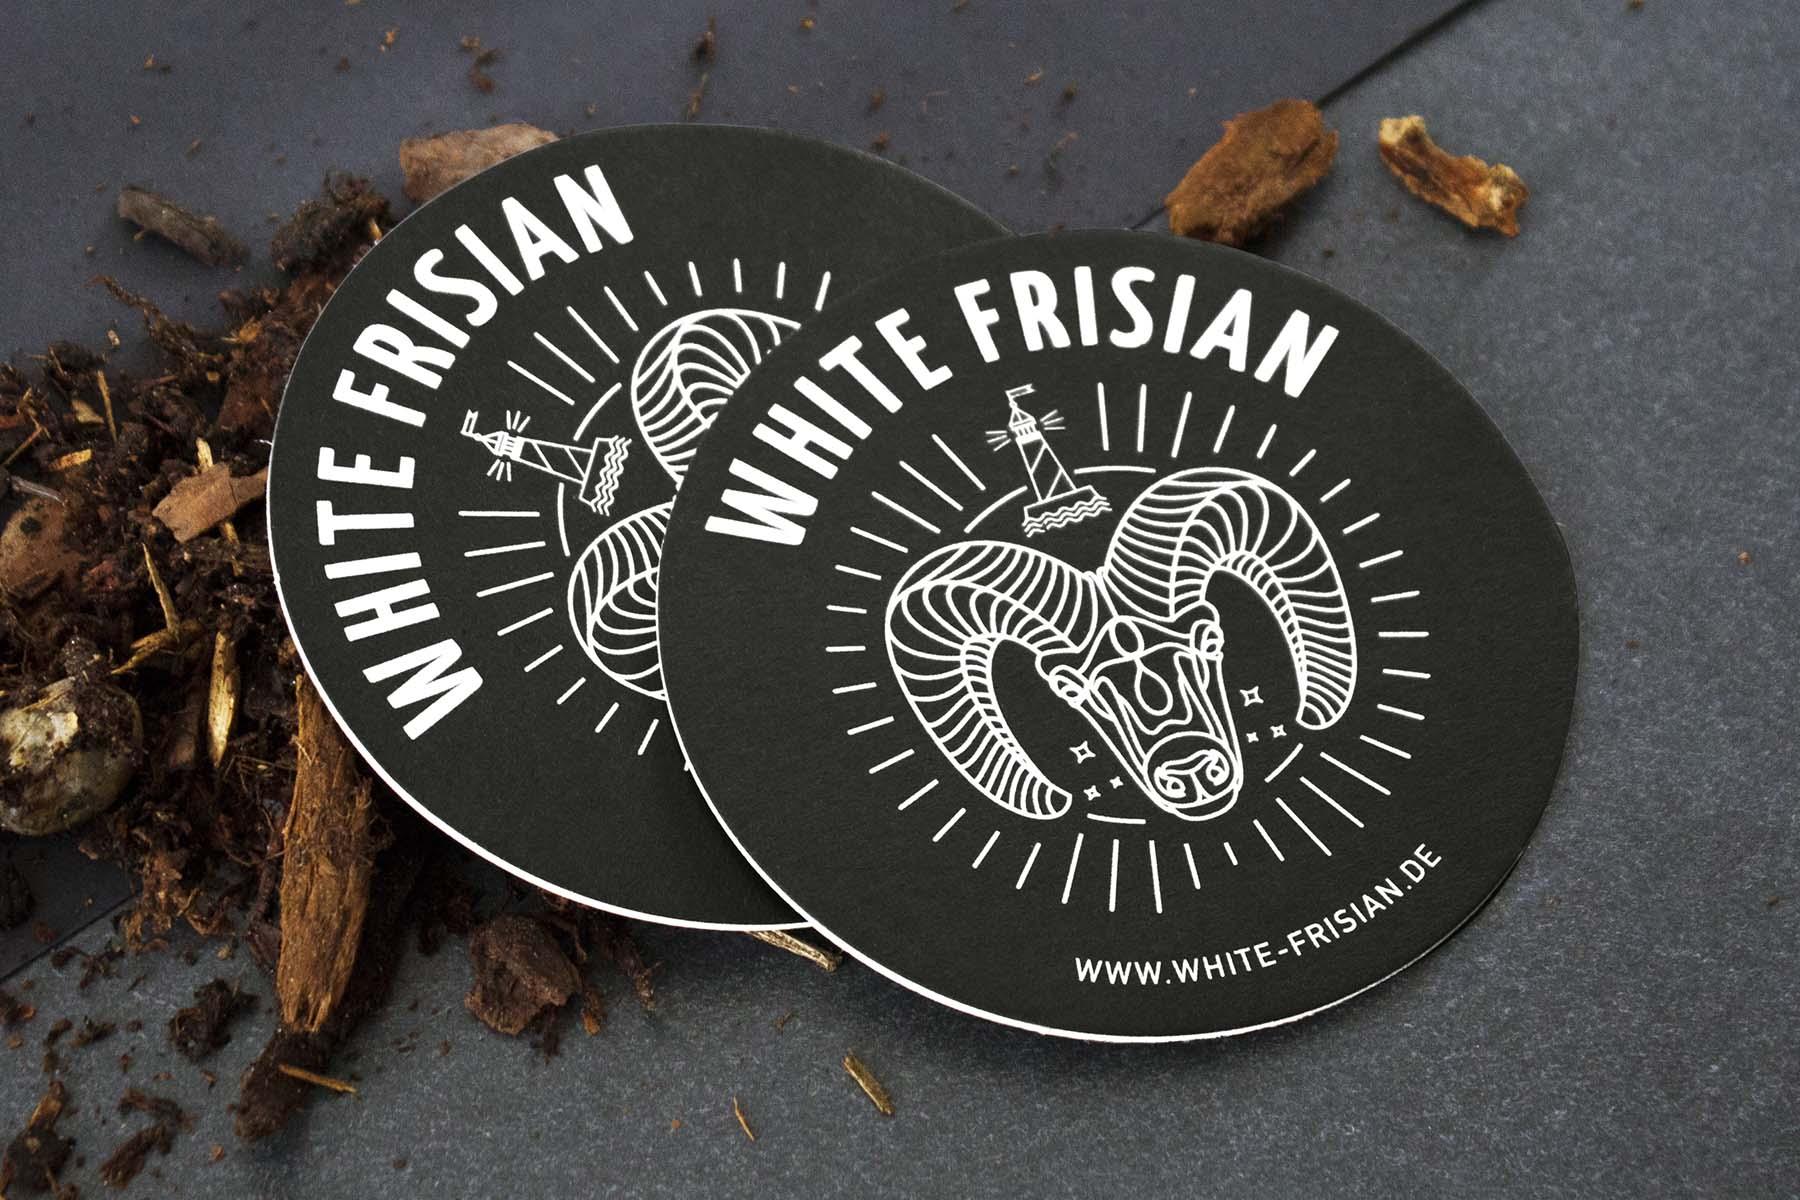 eh_referenzen_wf_3 Projekt - White Frisian